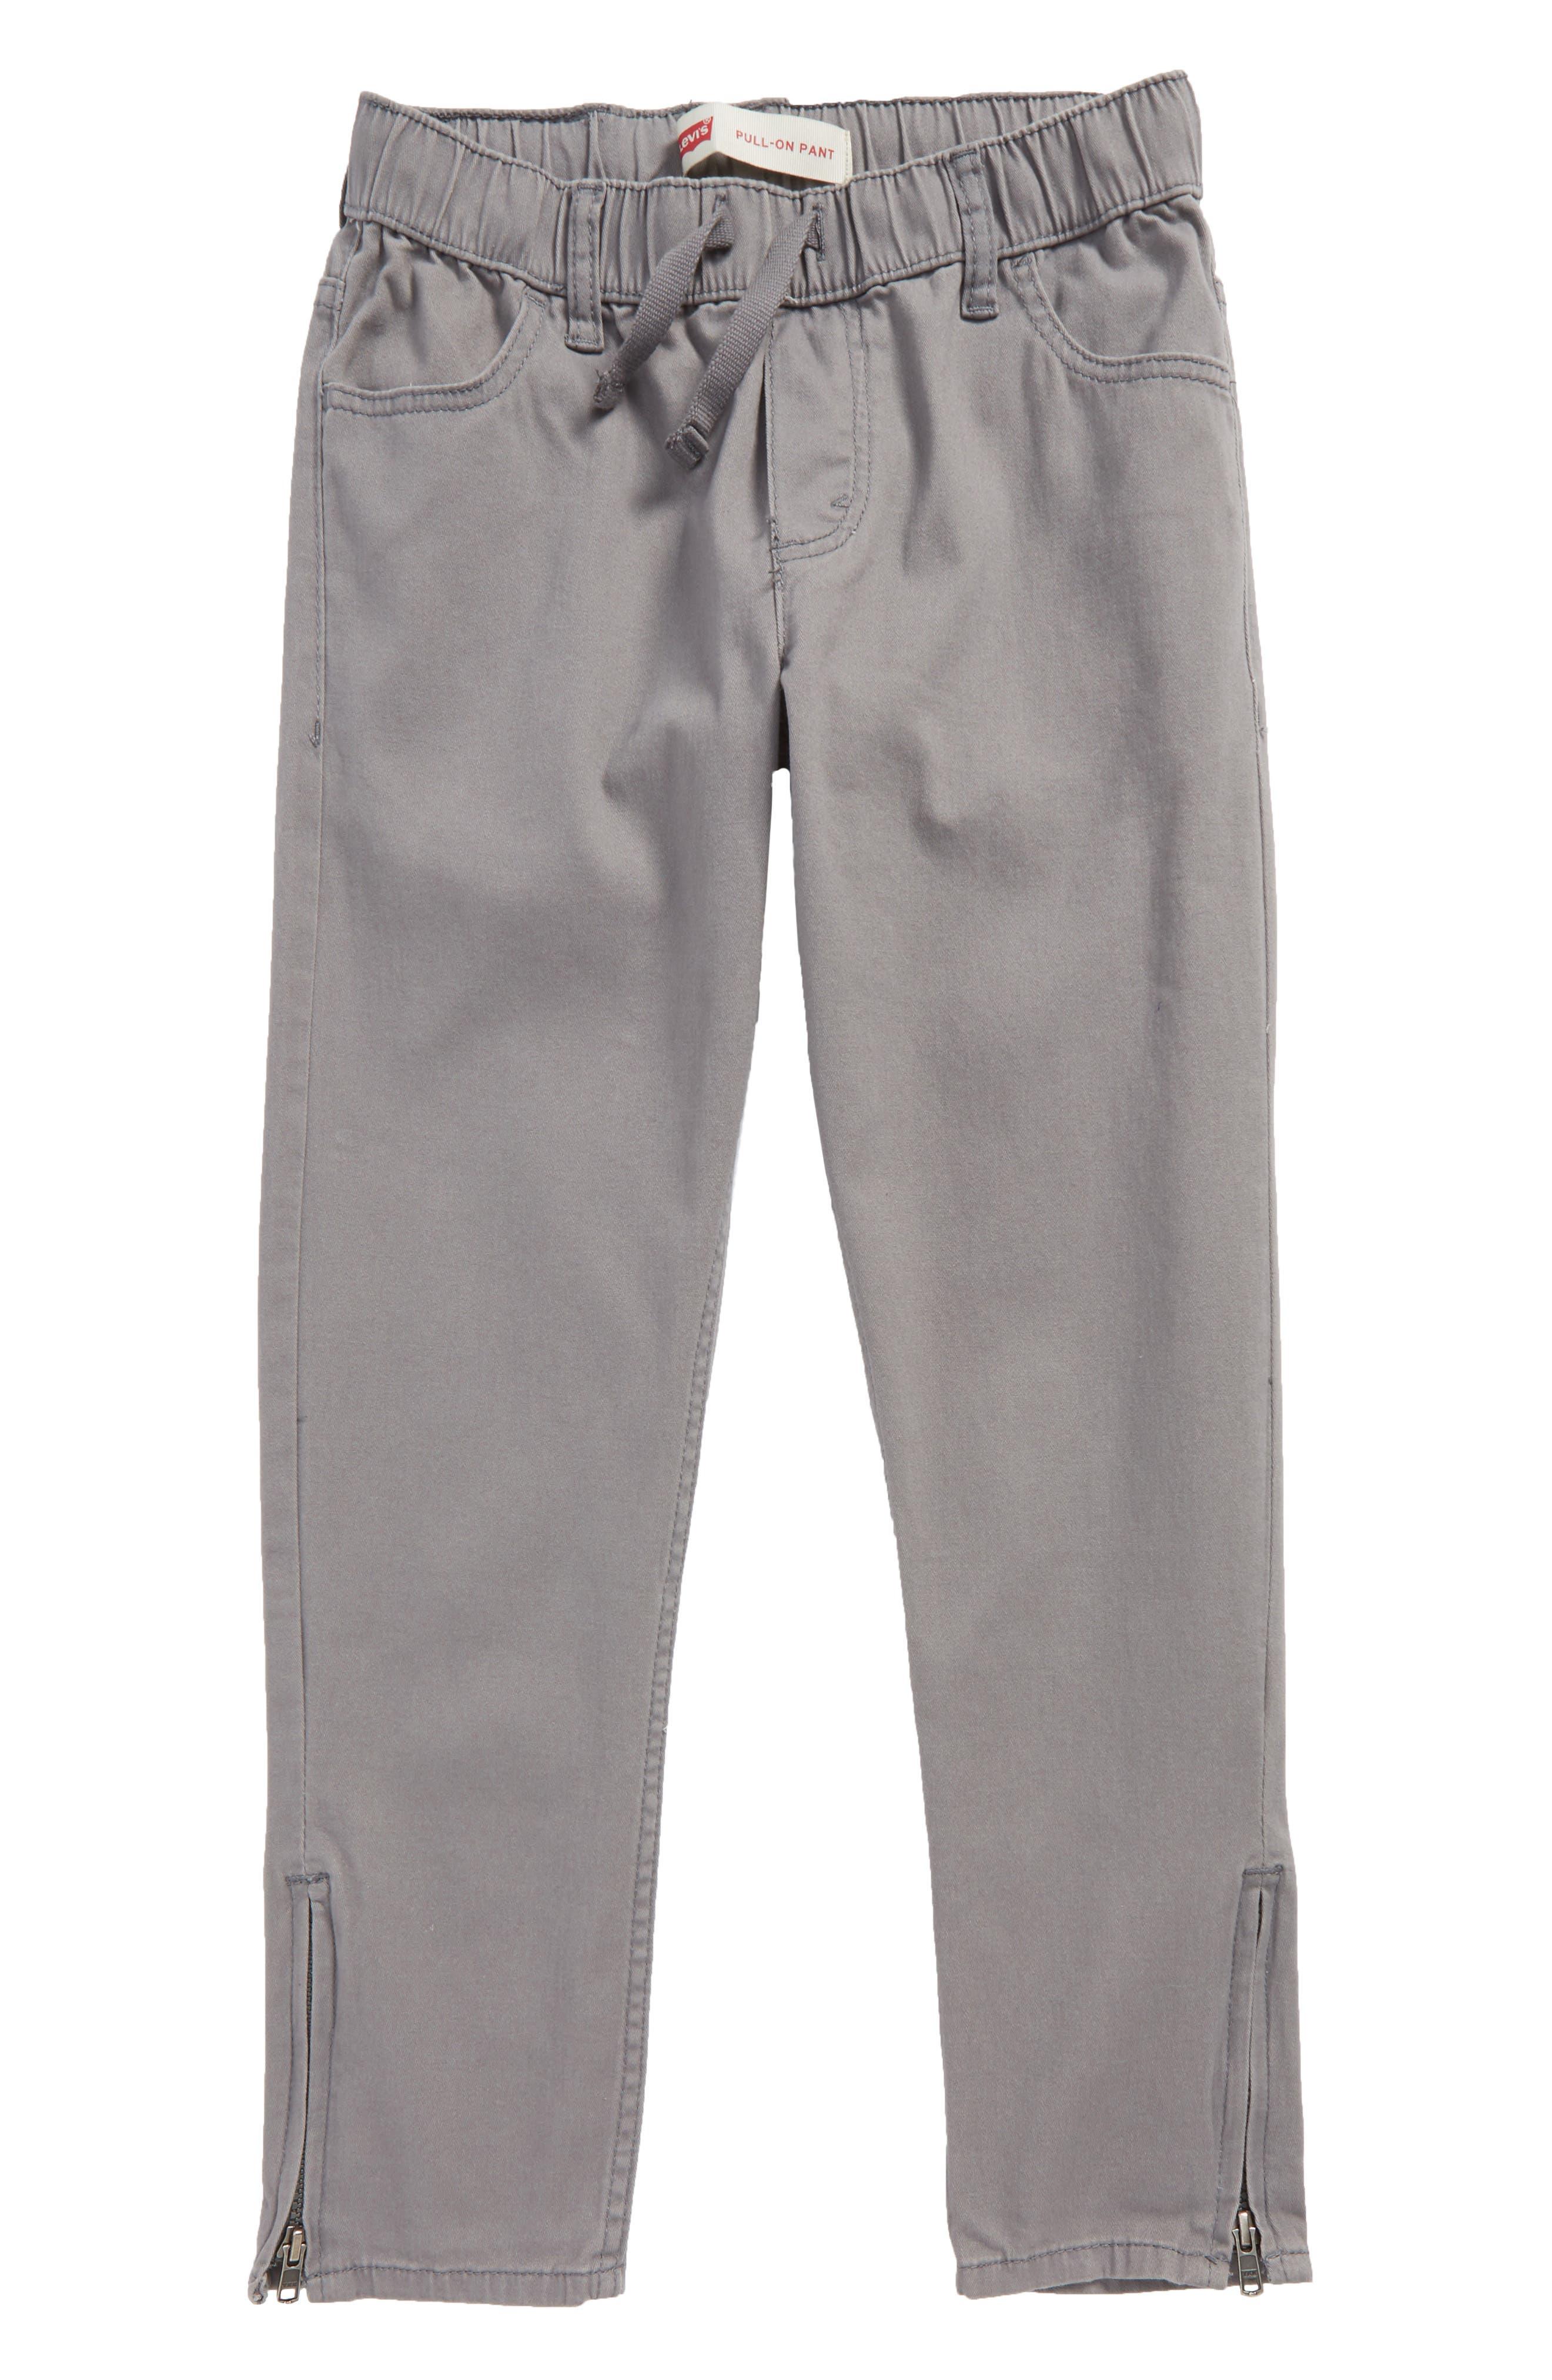 Main Image - Levi's® Zip Cuff Pull-On Pants (Big Boys)